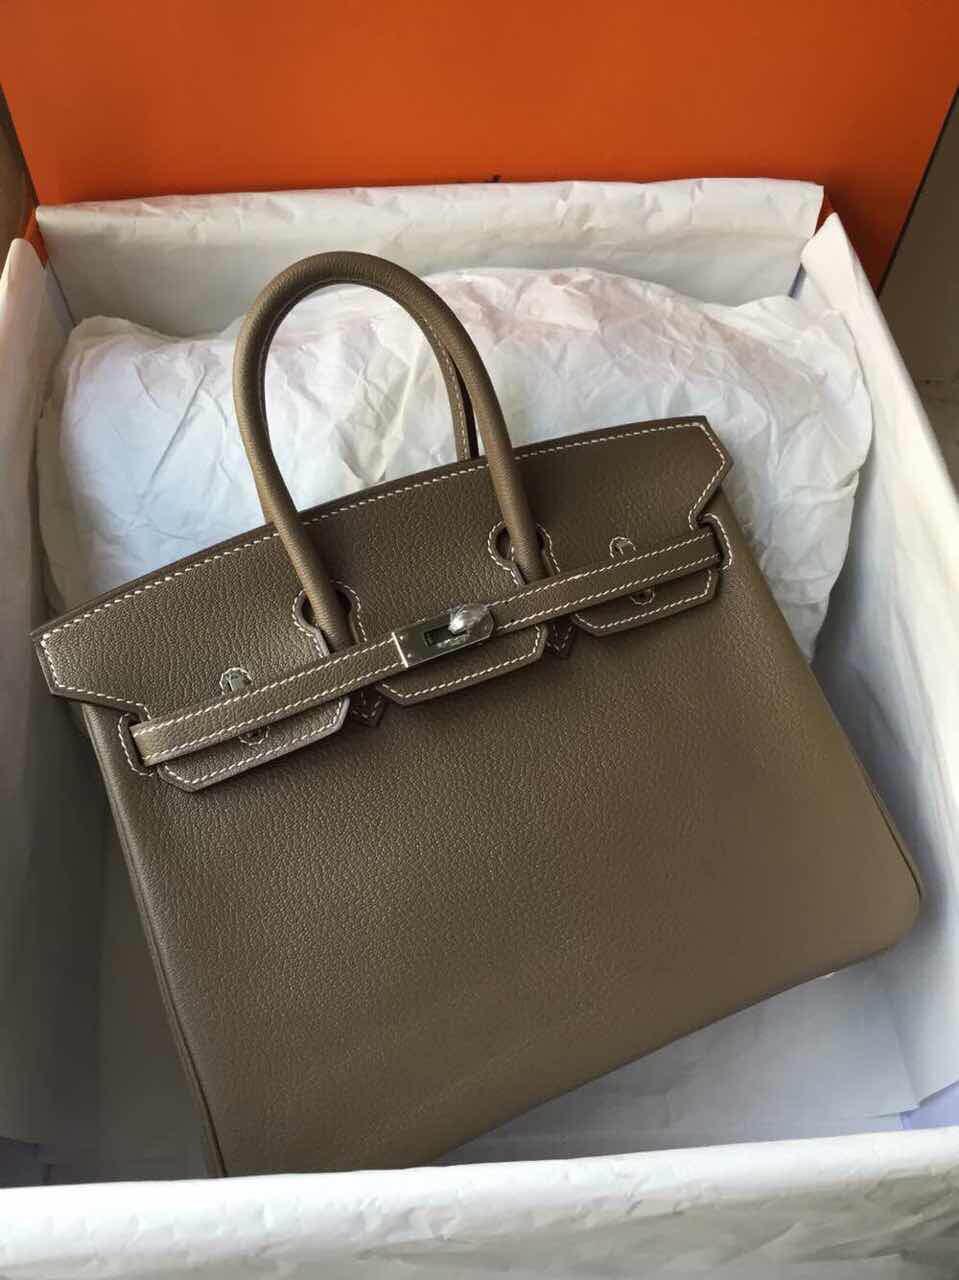 Wholesale Etoupe Grey Chevre Leather Hermes Birkin Bag Women's Tote Bag 25cm